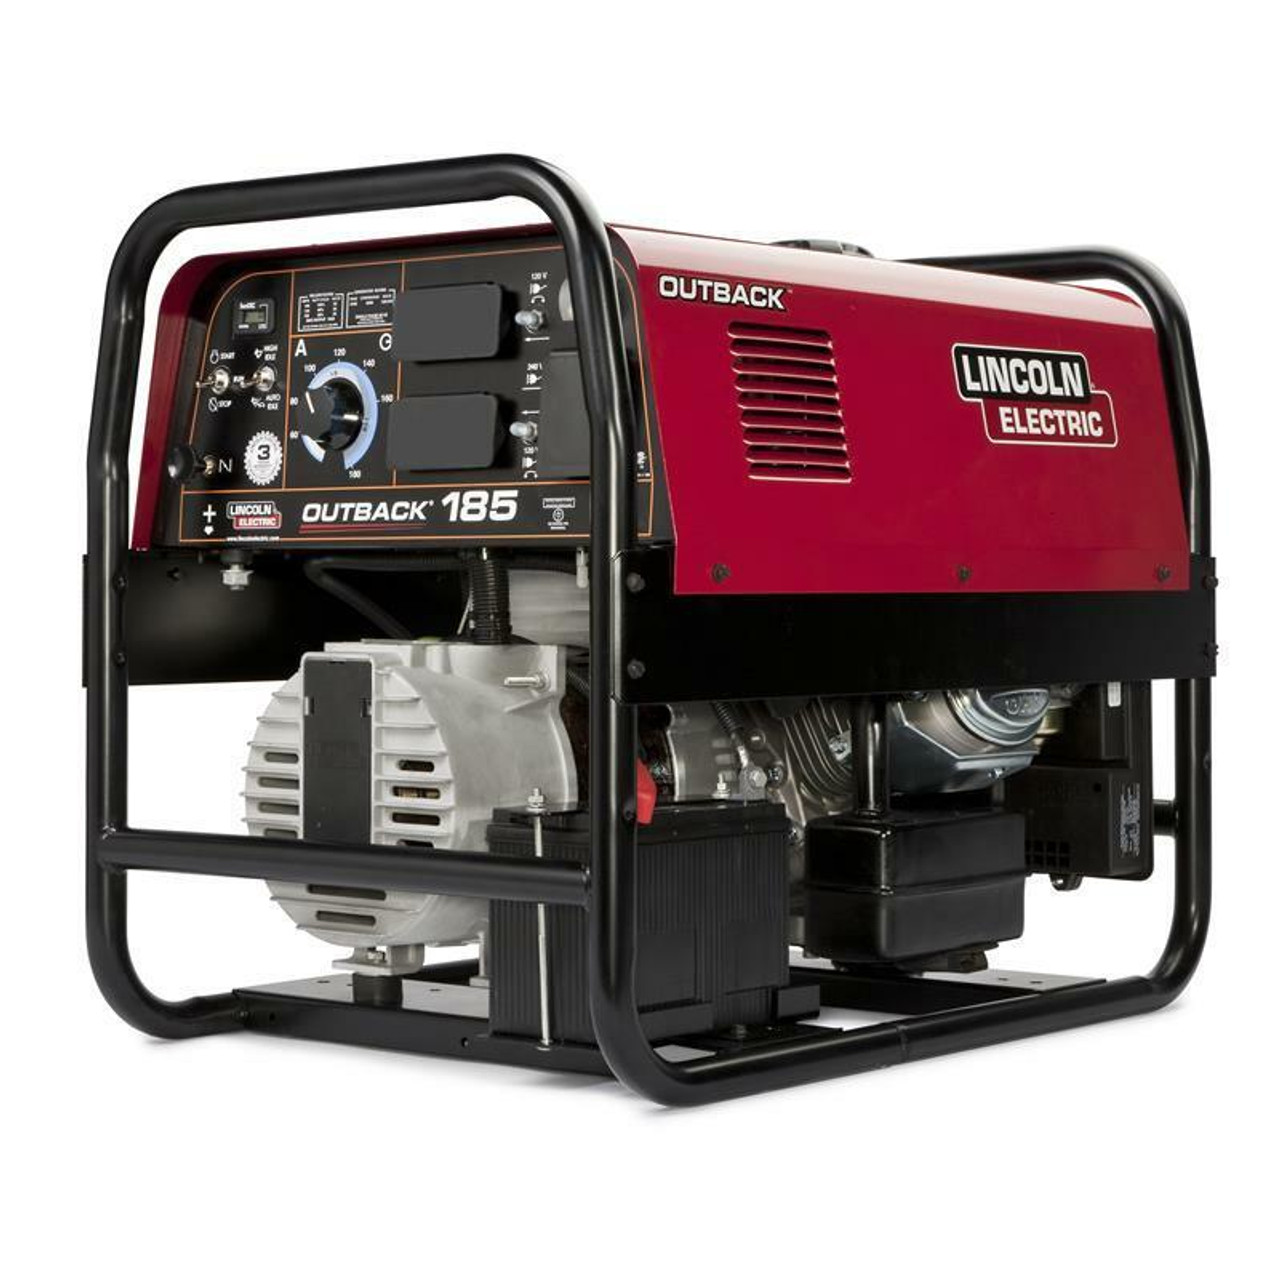 Lincoln Outback 185 Welder Generator K2706-2